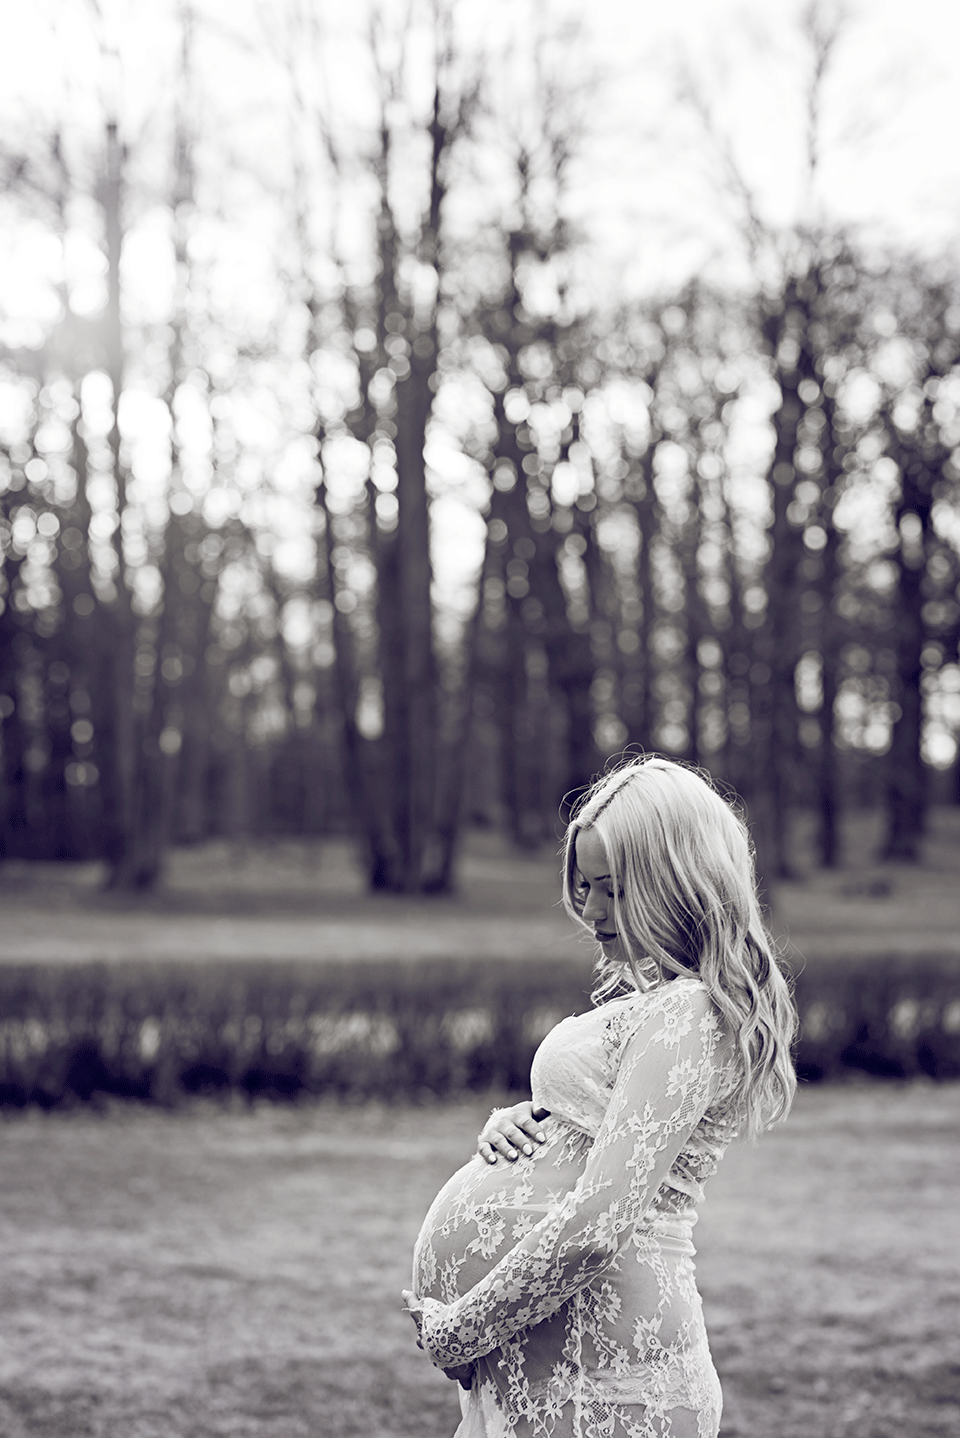 Fotograf-Emma-Schödin_Ellinor-Eriksson_030.png